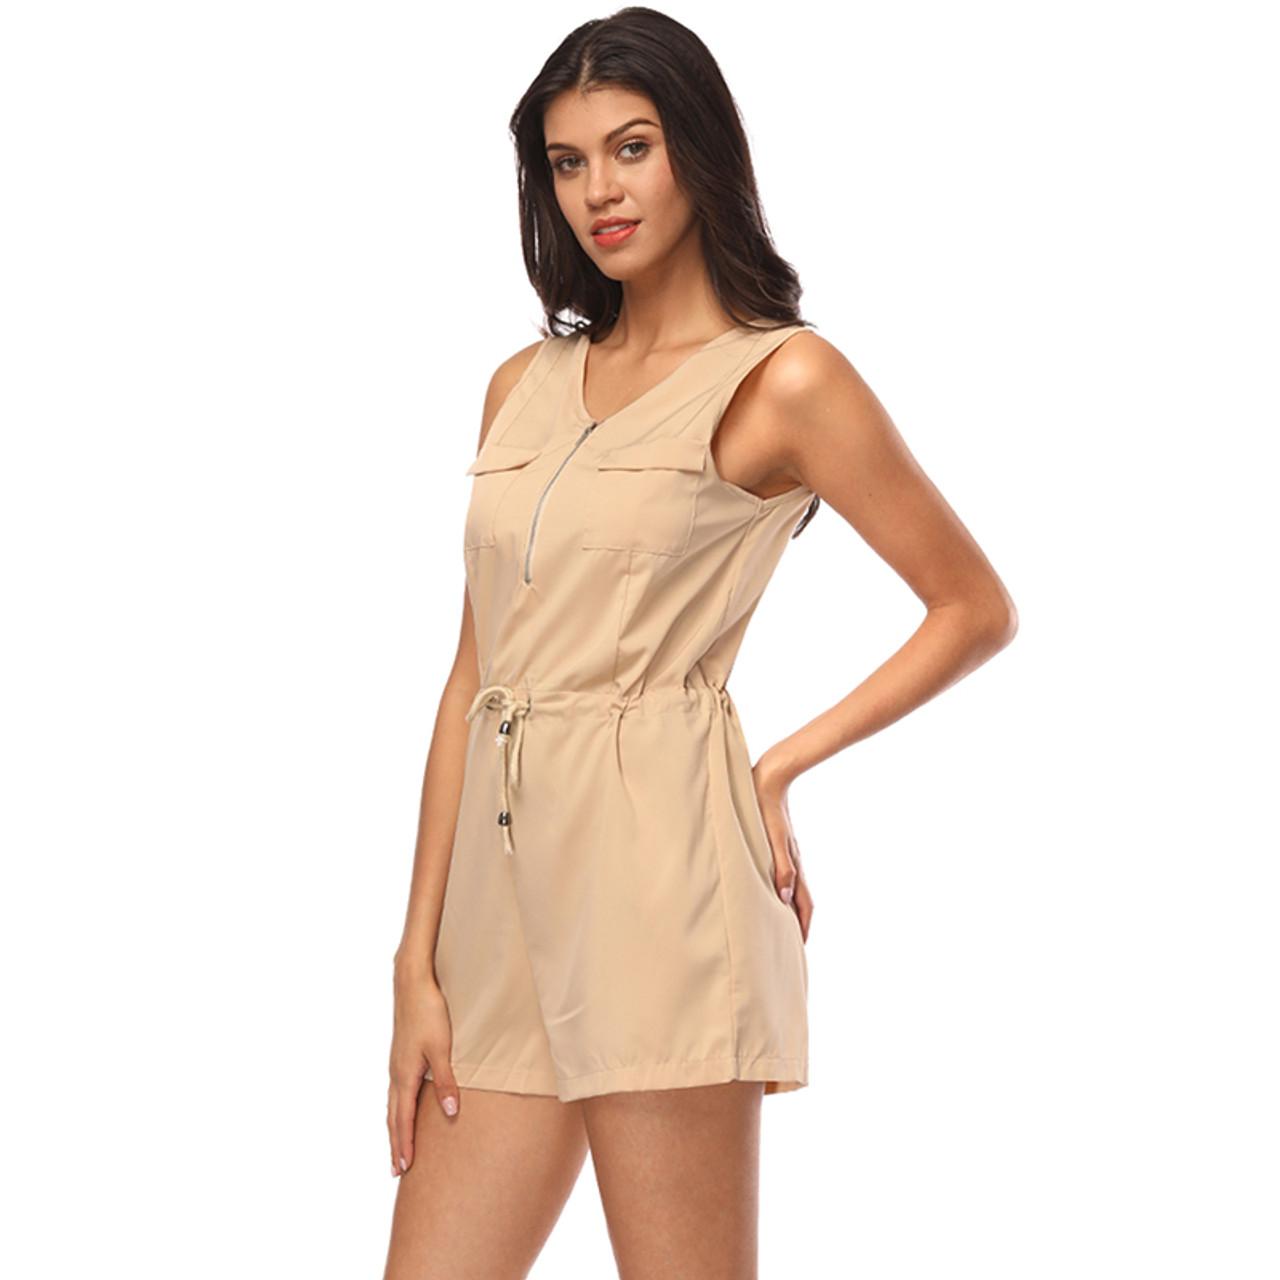 ... Sexy Sleeveless Bodysuit Women Jumpsuit Shorts Romper Summer V-neck  Zipper Pockets Playsuit Fashion Beach ... fac564f5a